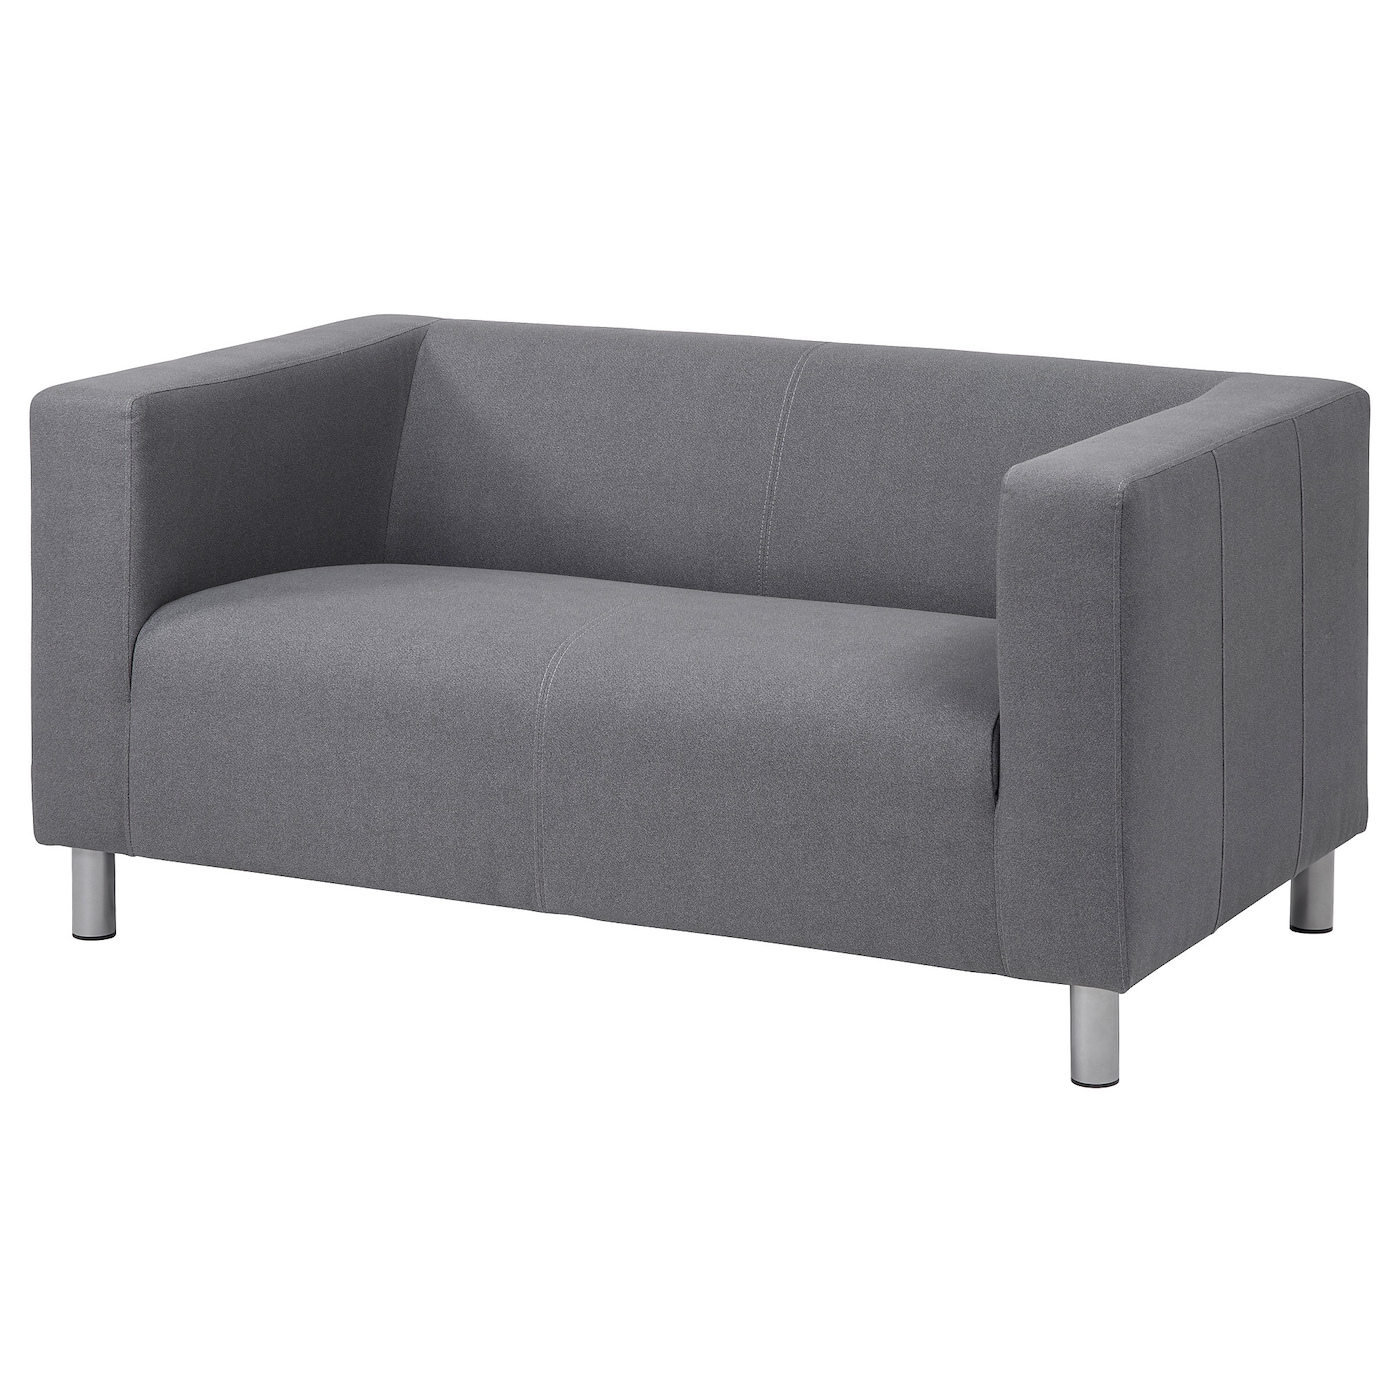 Ikea Klippan Compact 2 Seat Sofa